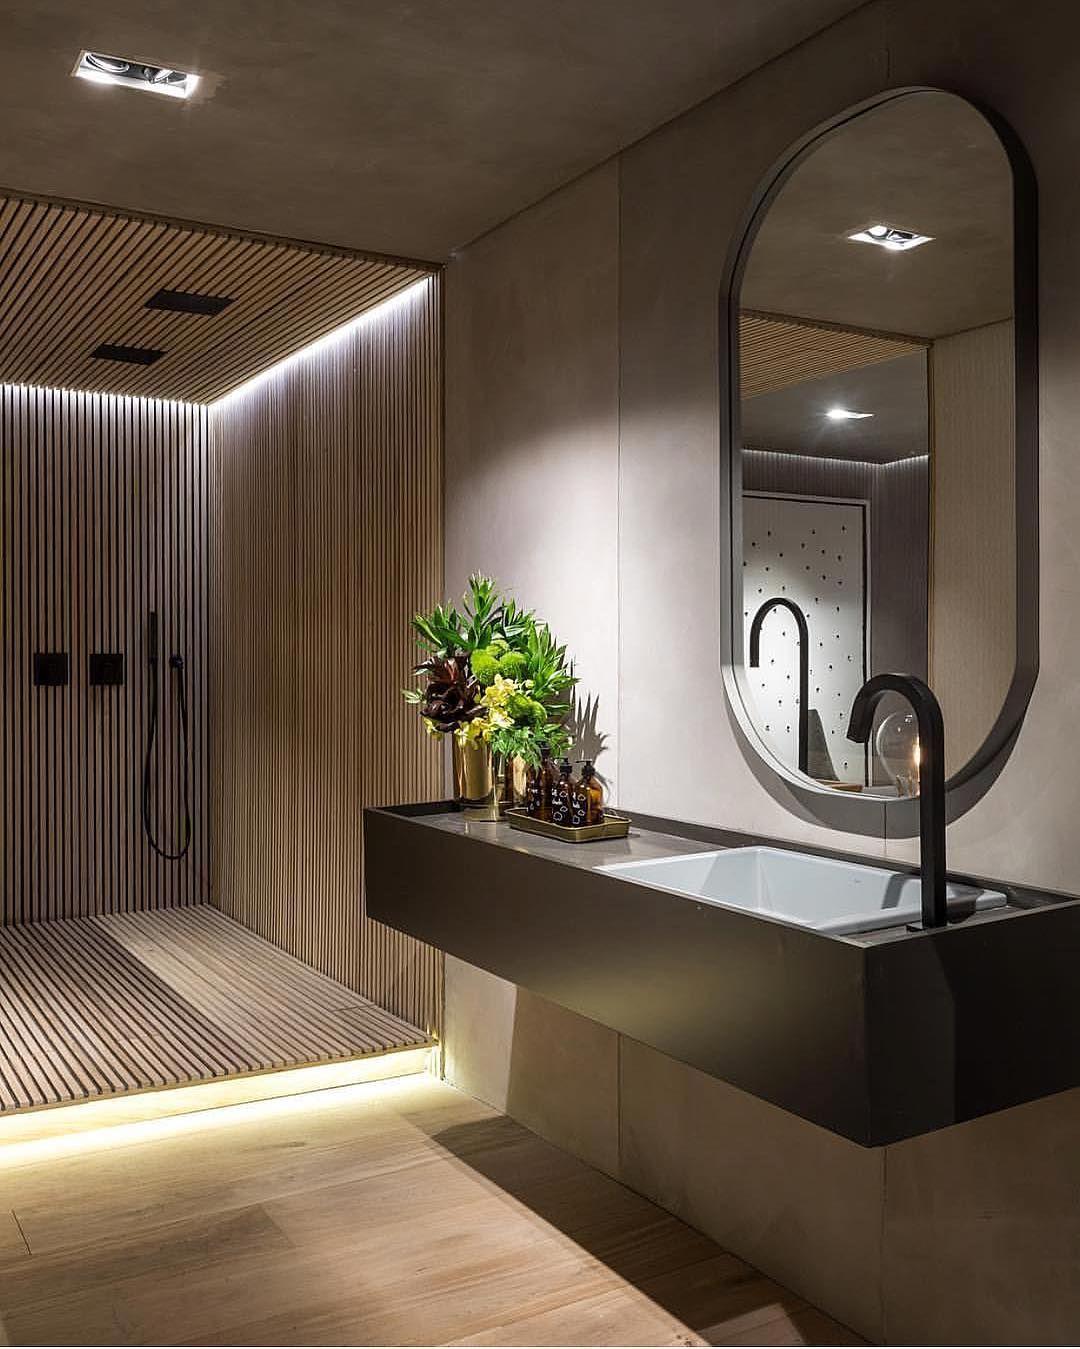 kari haugsrud futurenordichome op instagram salle de. Black Bedroom Furniture Sets. Home Design Ideas